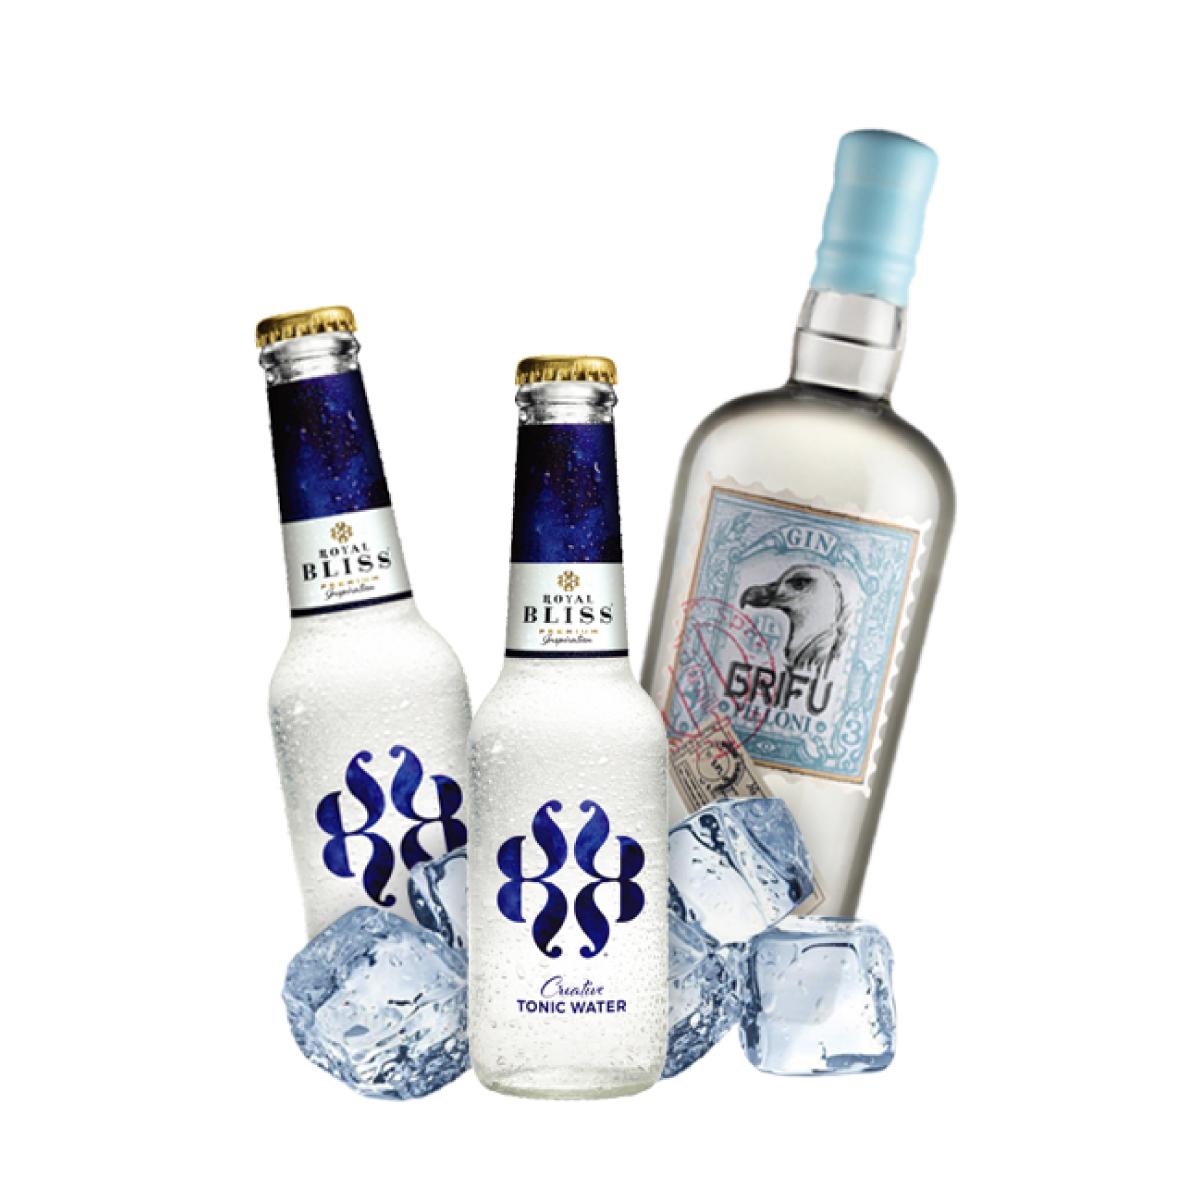 Royal Bliss Royal Blue Navy - Gin Tonic Cocktail Kit per 10 persone